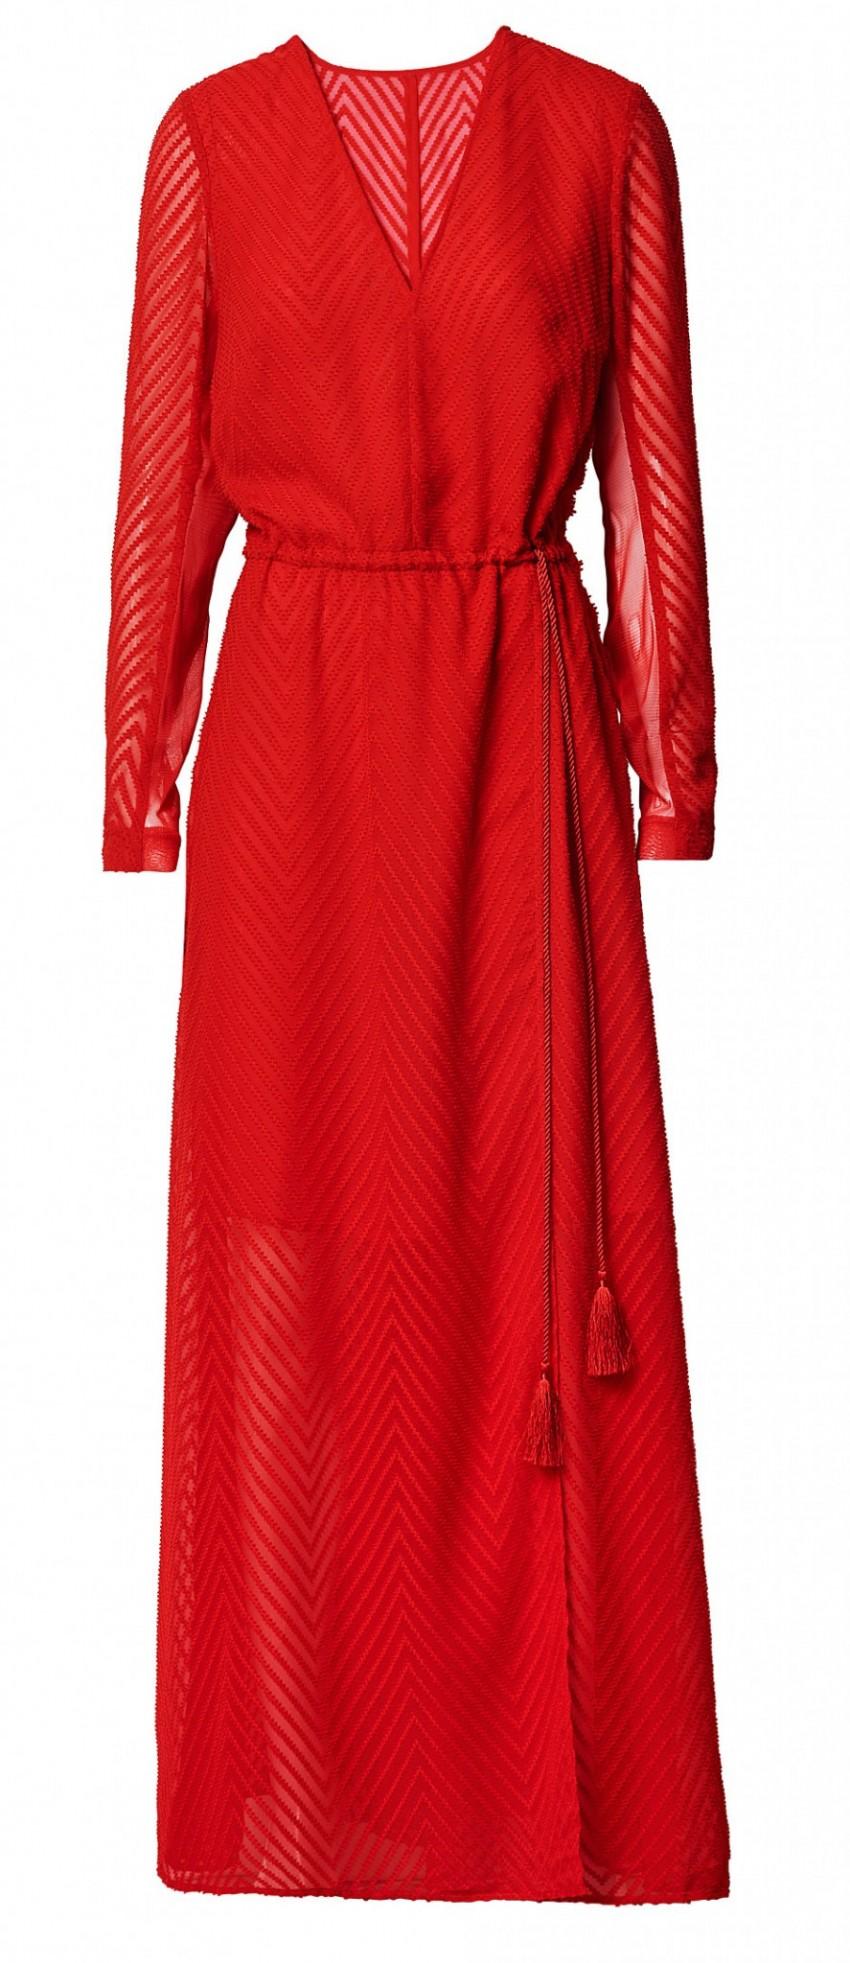 Vestido, H&M, €19,99